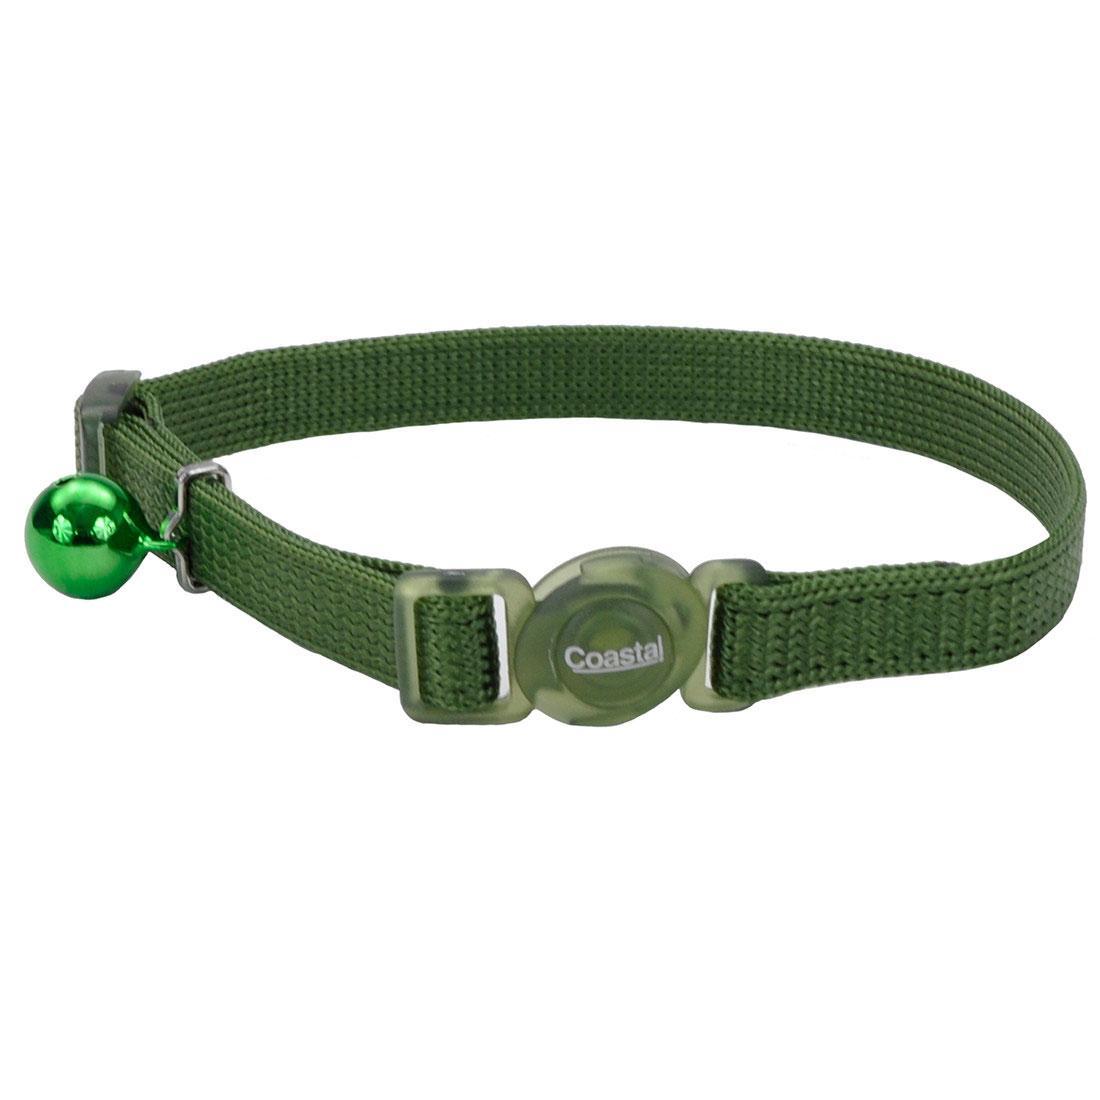 Safe Cat Adjustable Snag-Proof Breakaway Cat Collar, Palm Green, 3/8-in x 8-12-in